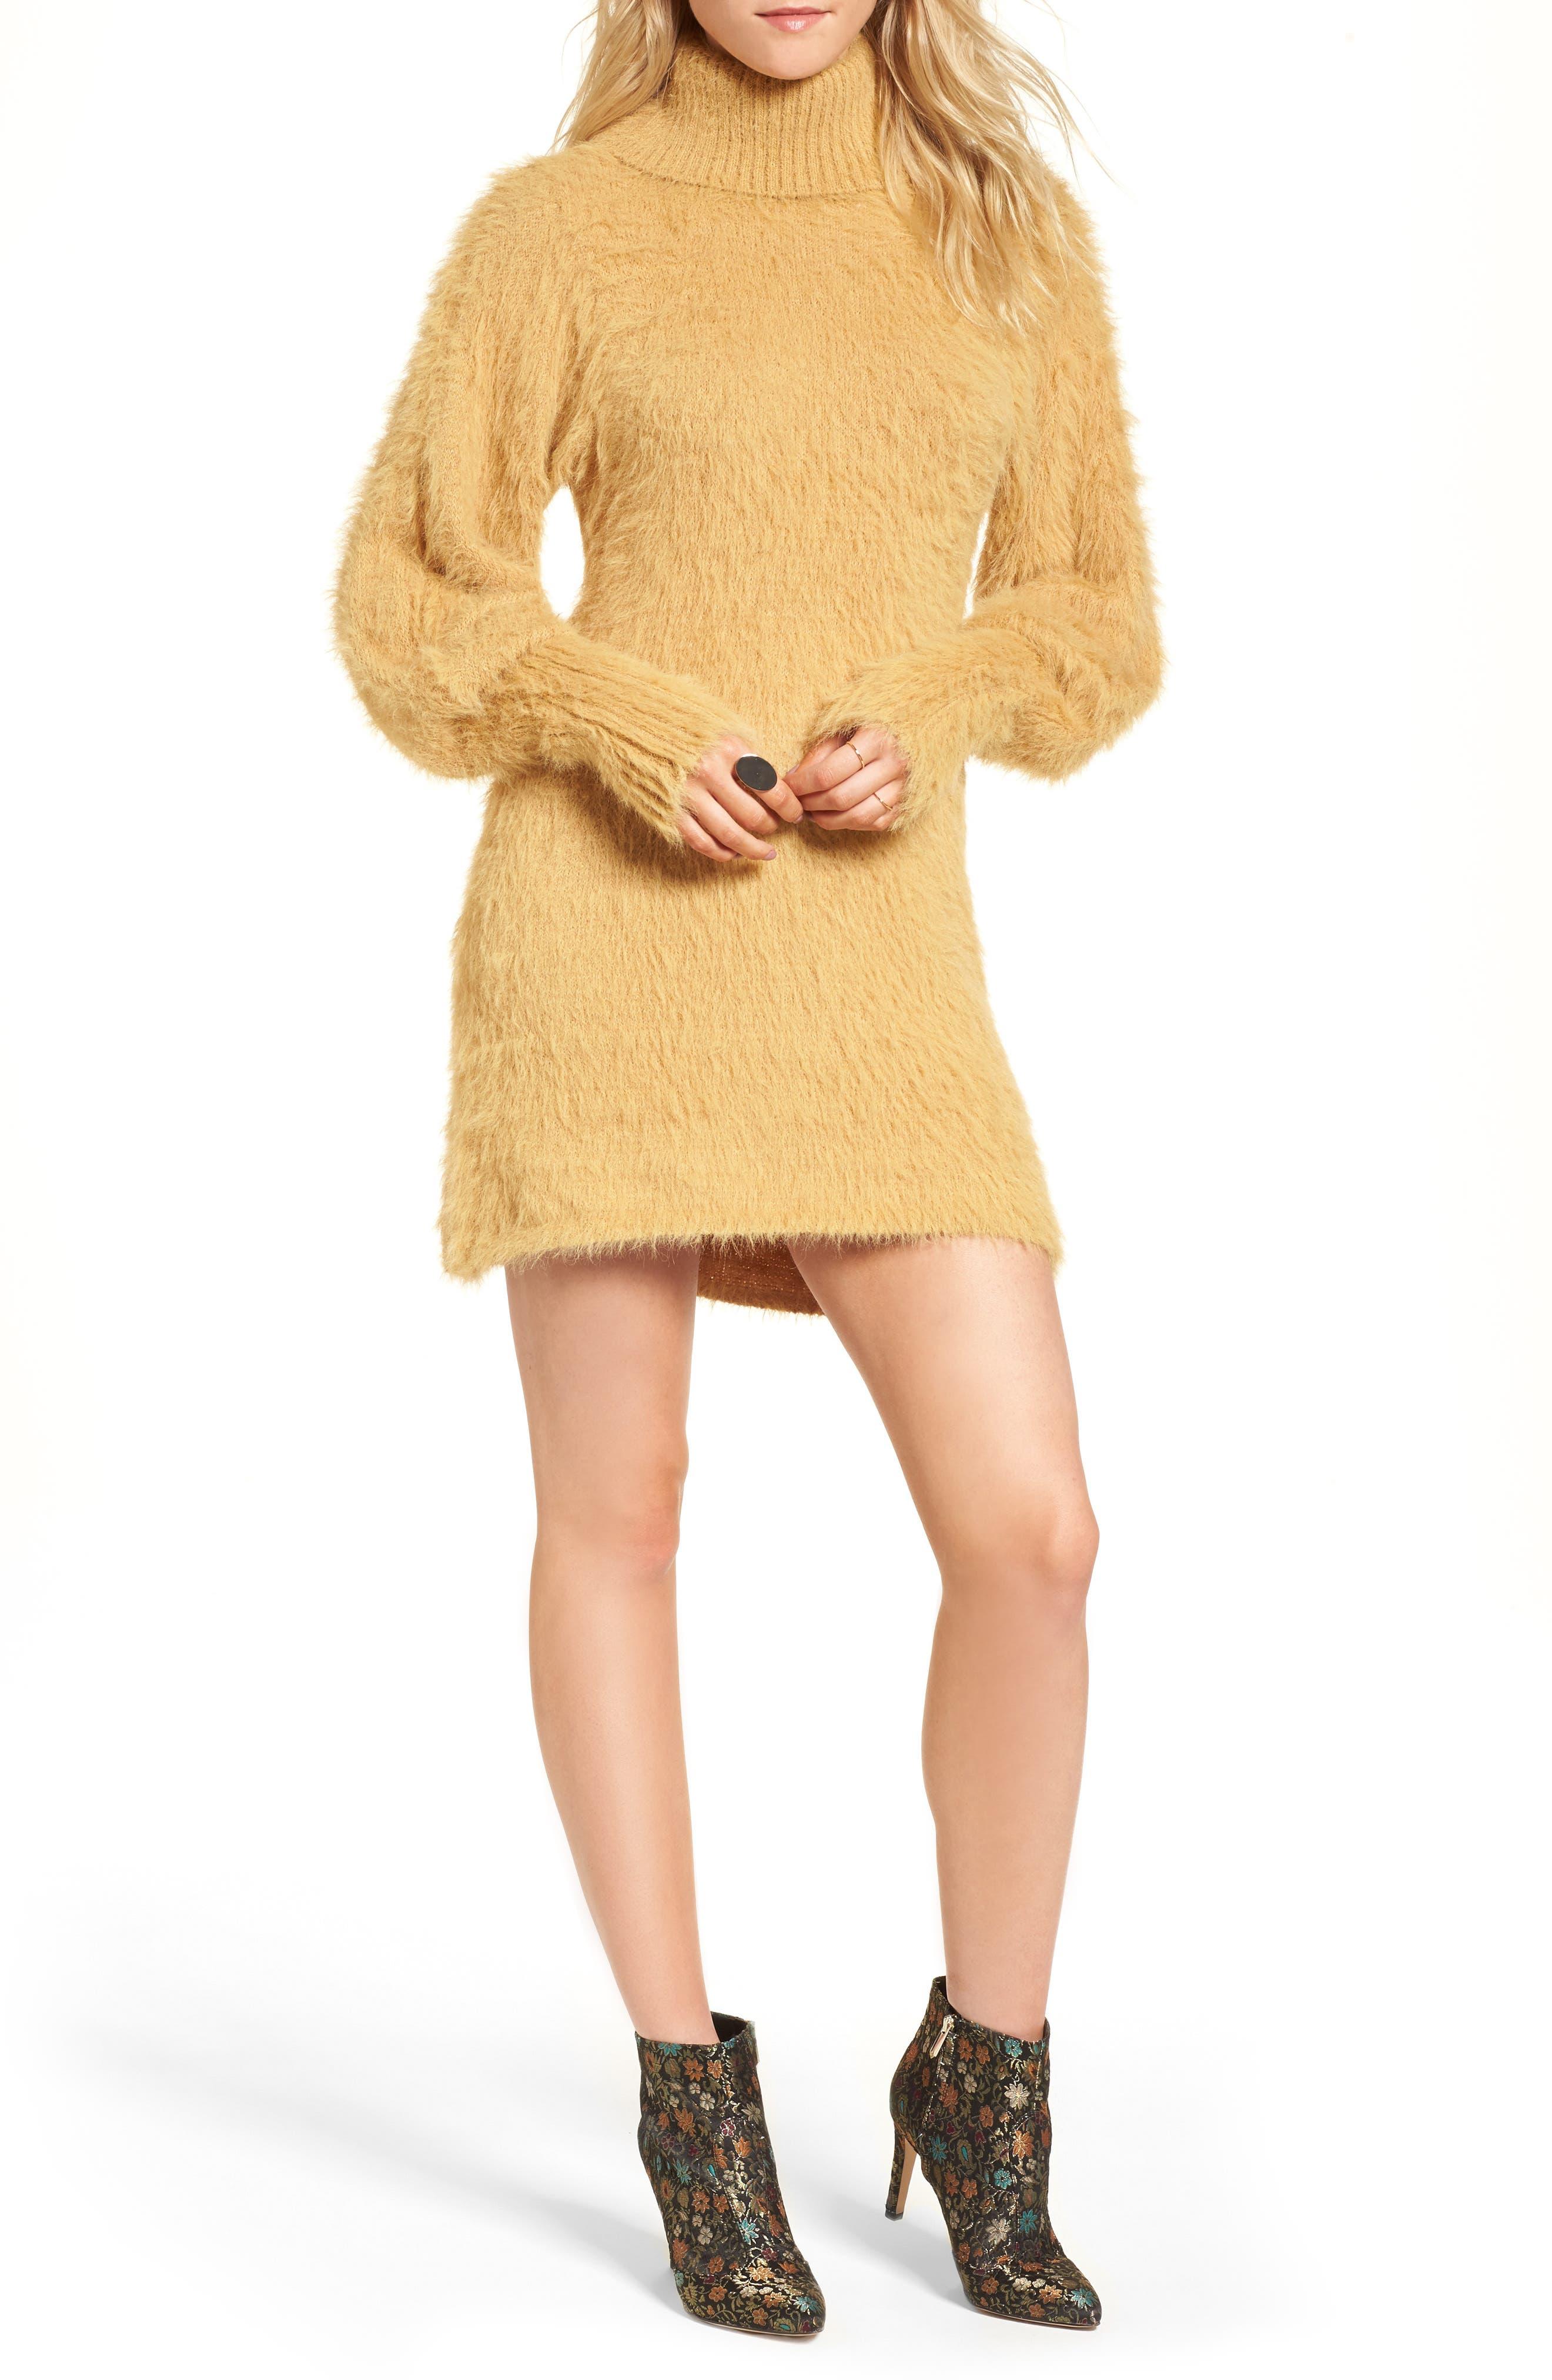 Alternate Image 1 Selected - Free People Honey Turtleneck Minidress